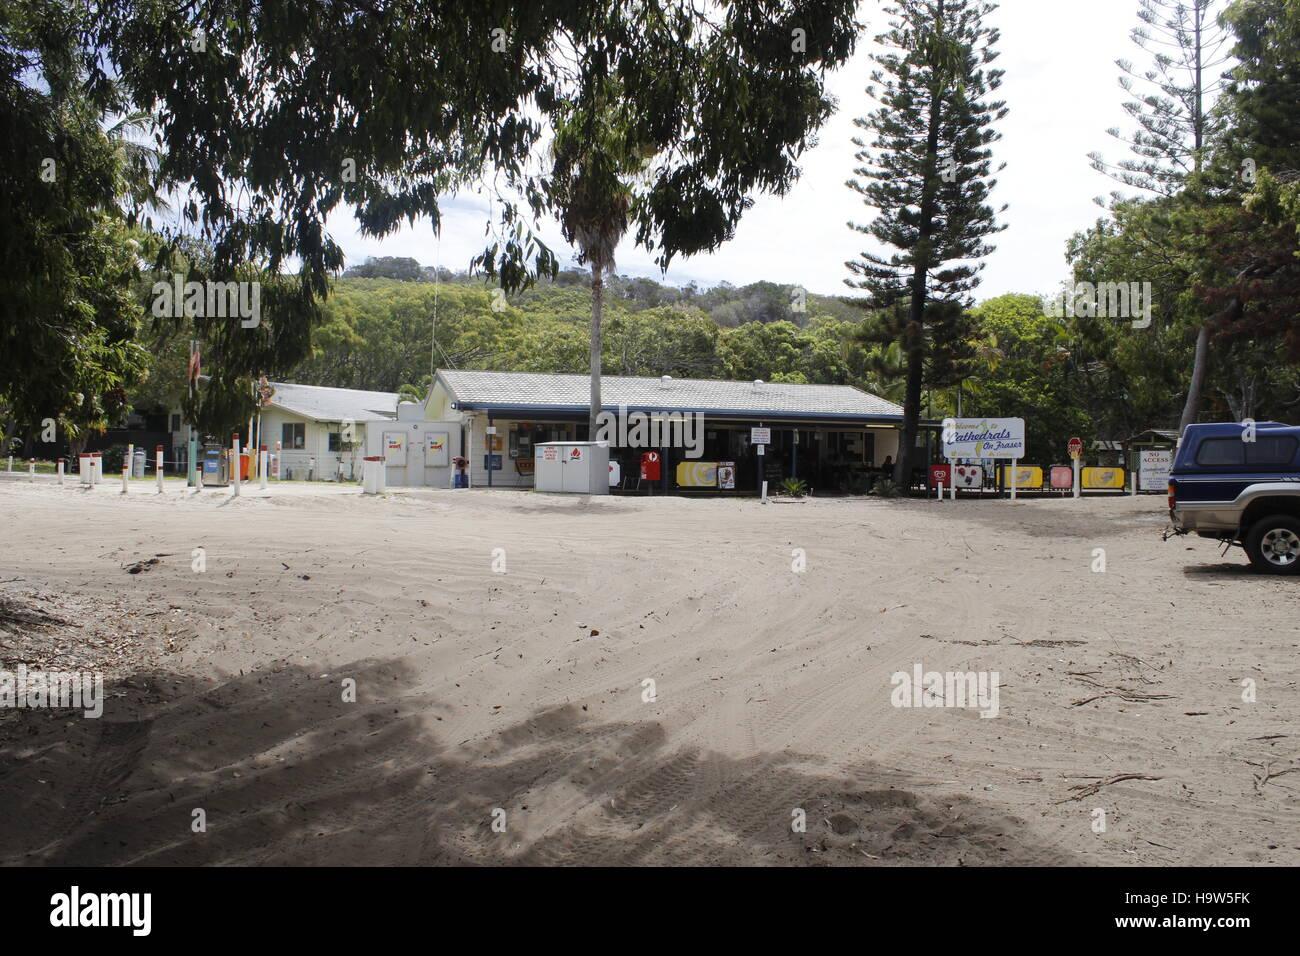 Fuel Station at Fraser Island, QLD, Australia - Stock Image